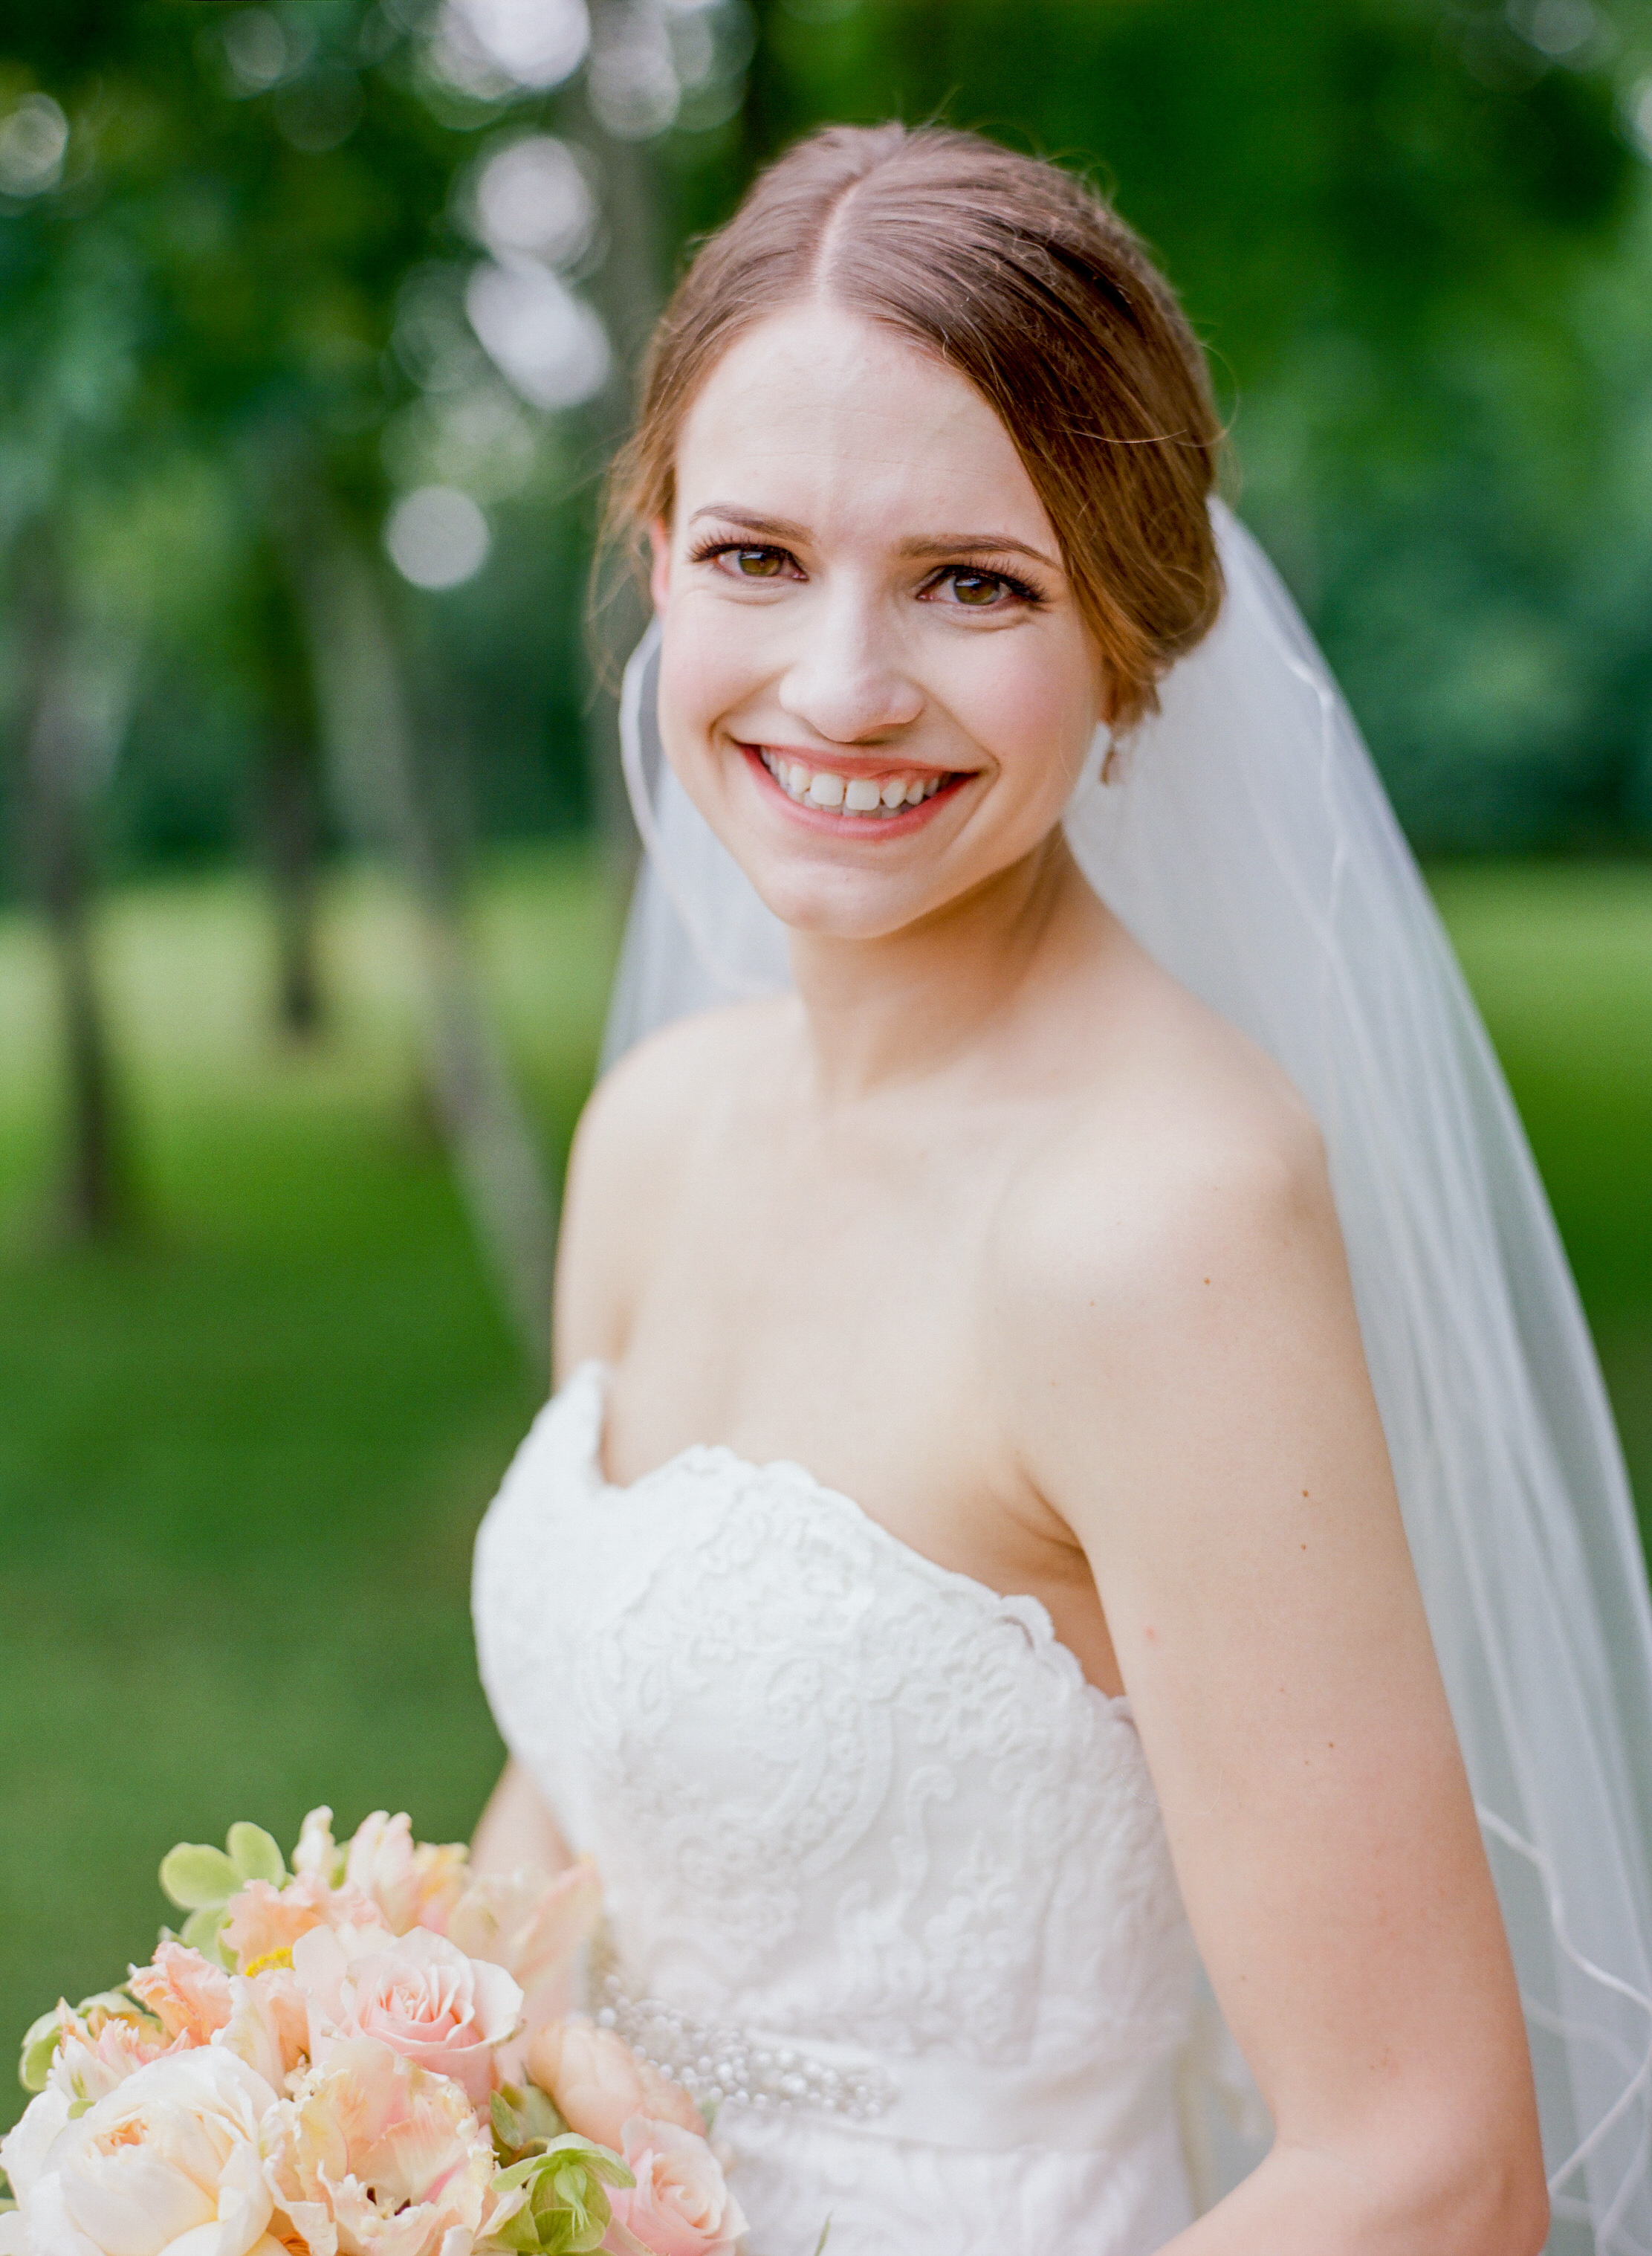 The-Knot-Wedding-Houston-Photographer-Fine-Art-Dana-Fernandez-Photography-Film-7.jpg